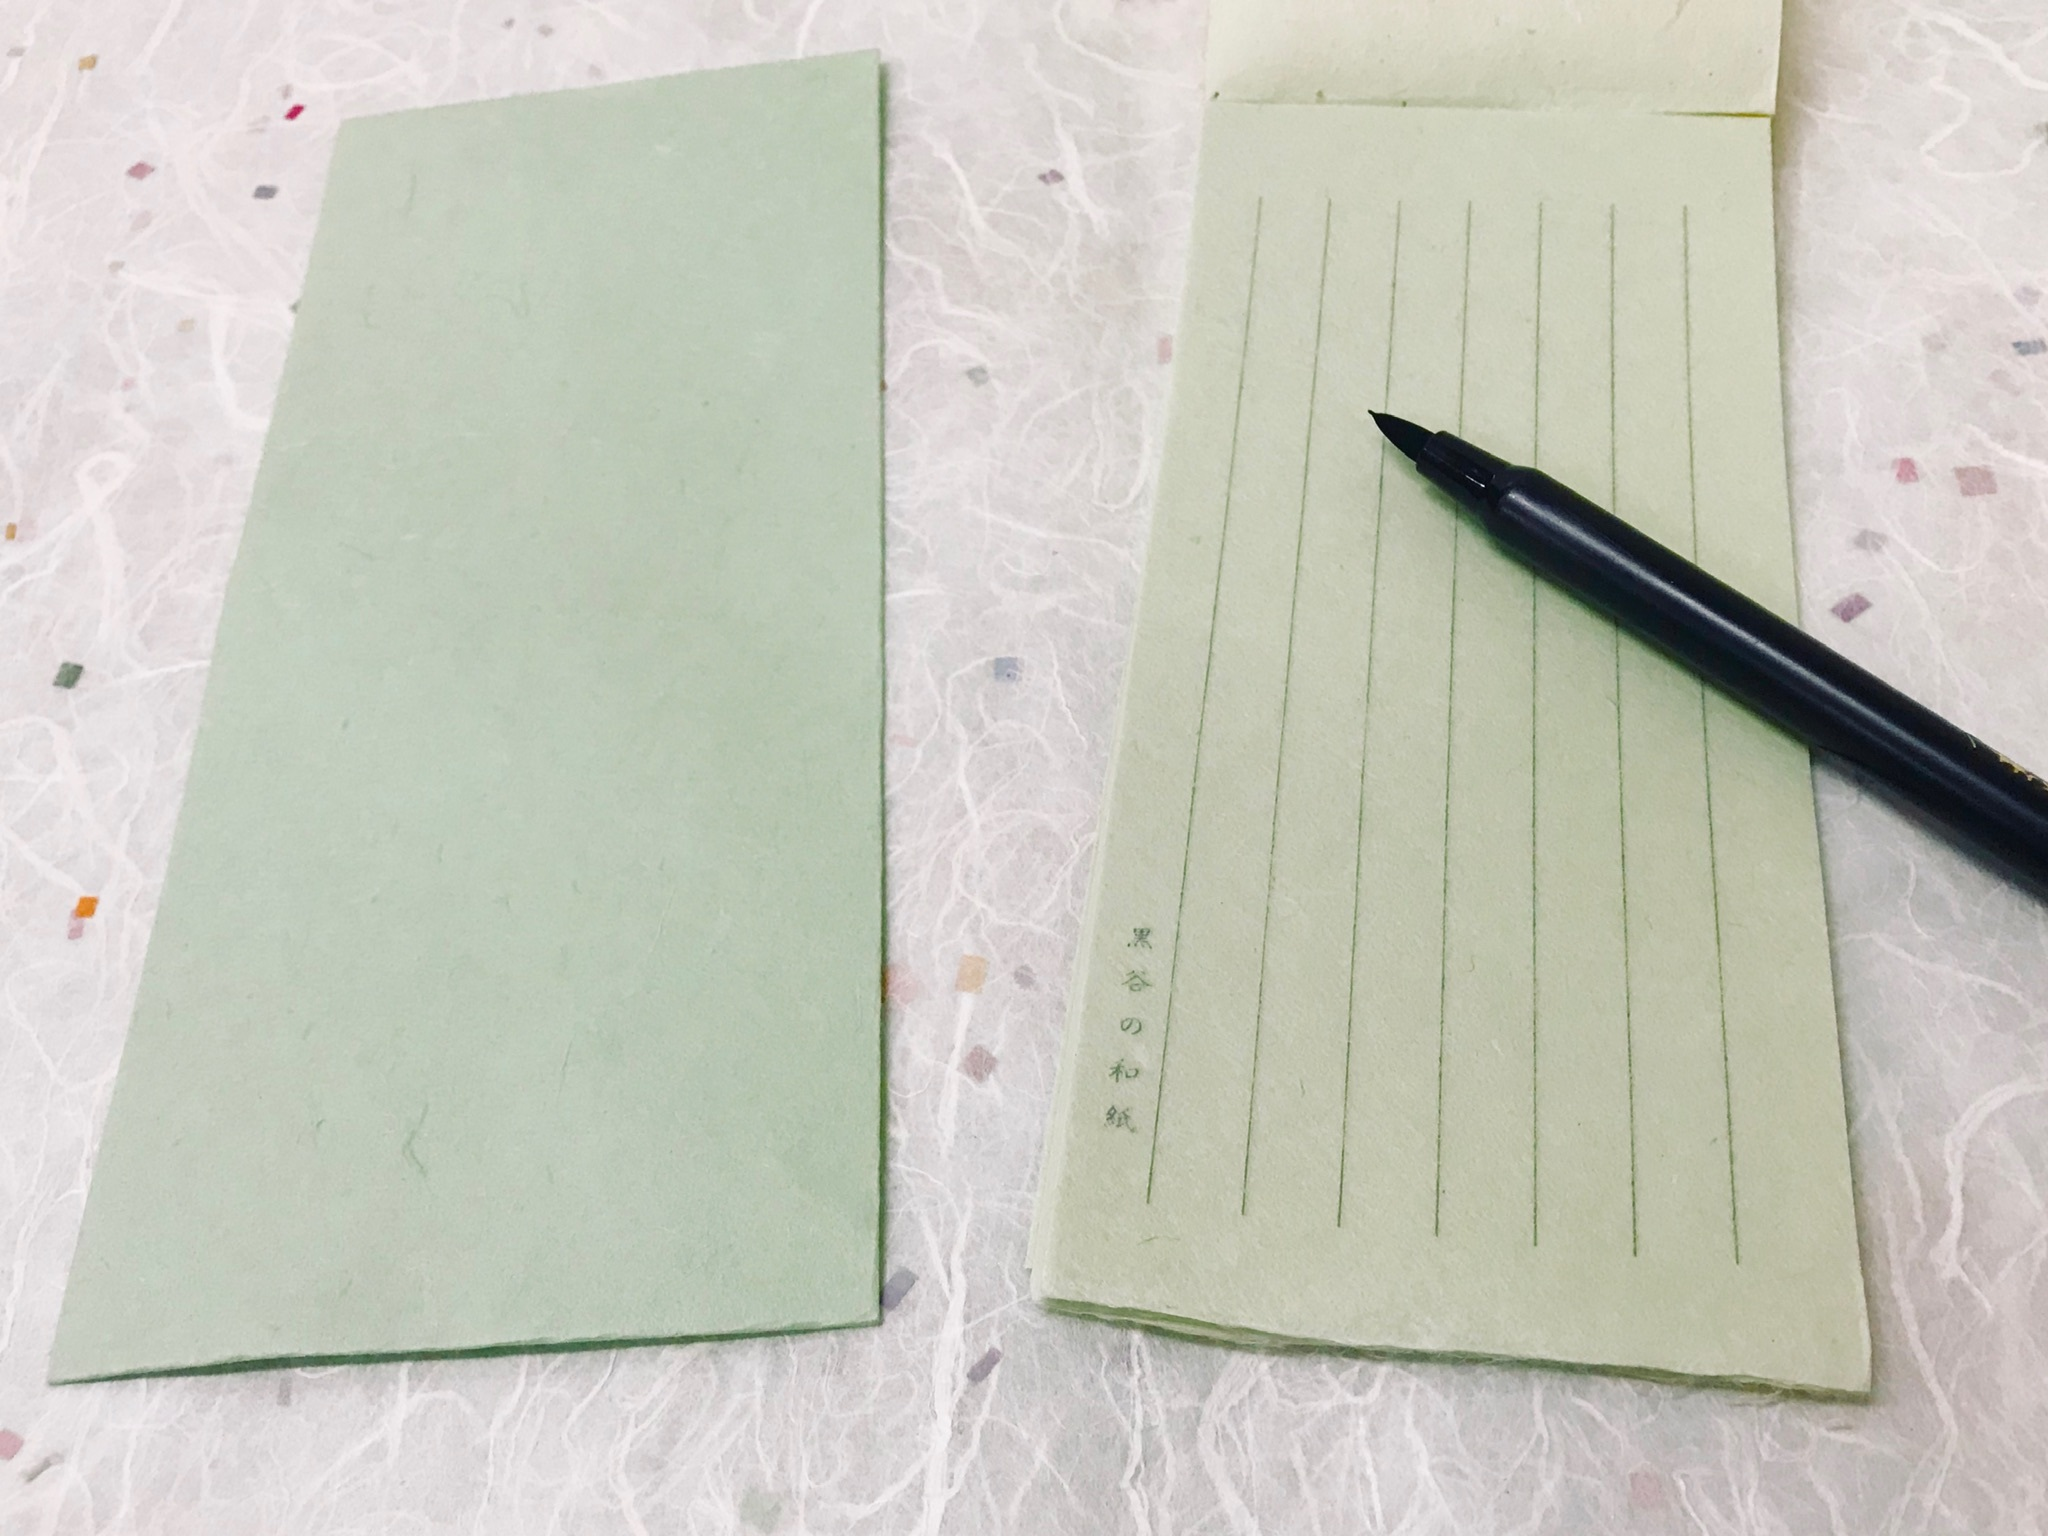 京都黒谷和紙  一筆箋  和封筒セット(黄緑色)